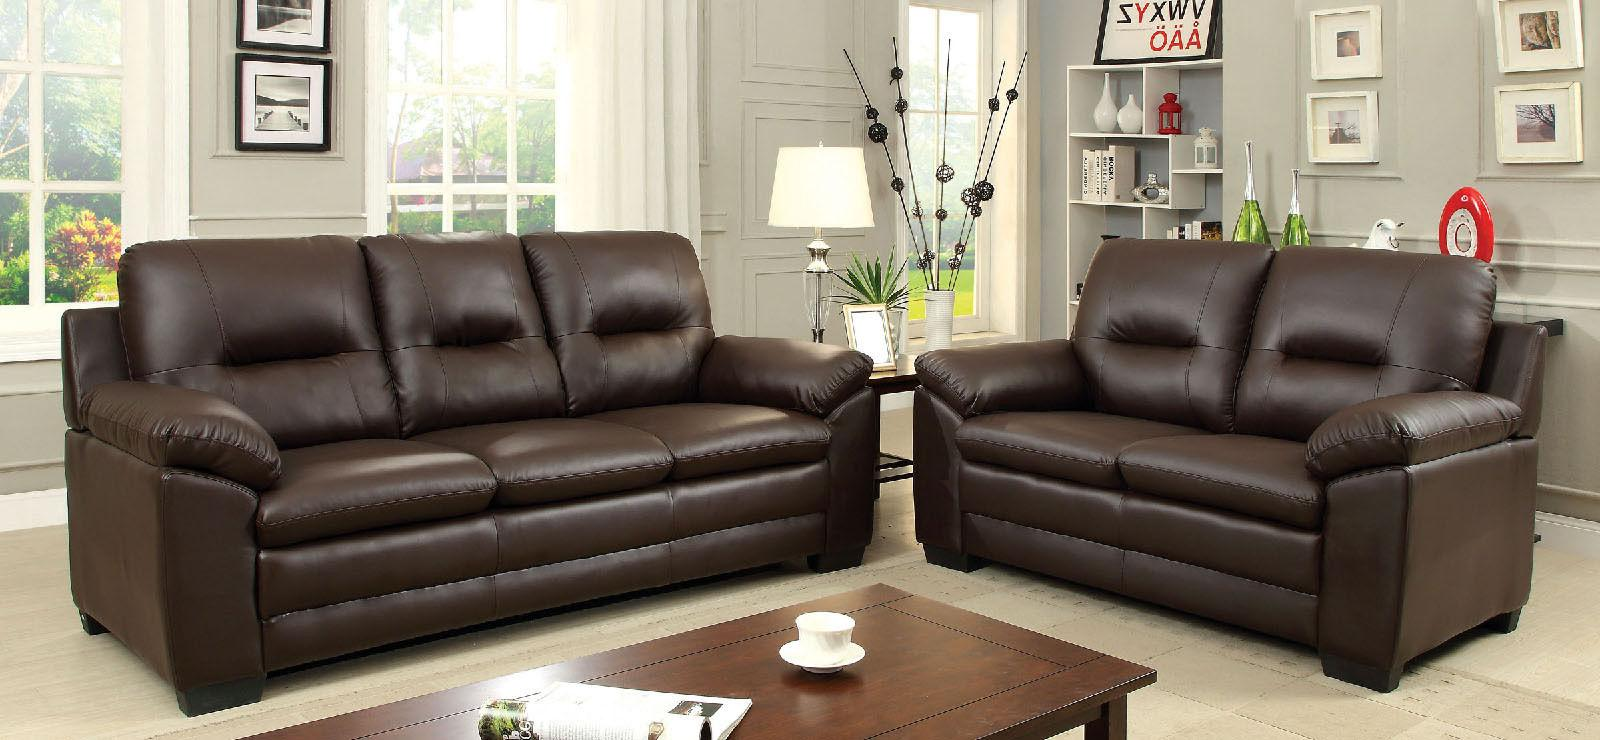 living room brown chic modern sofa loveseat